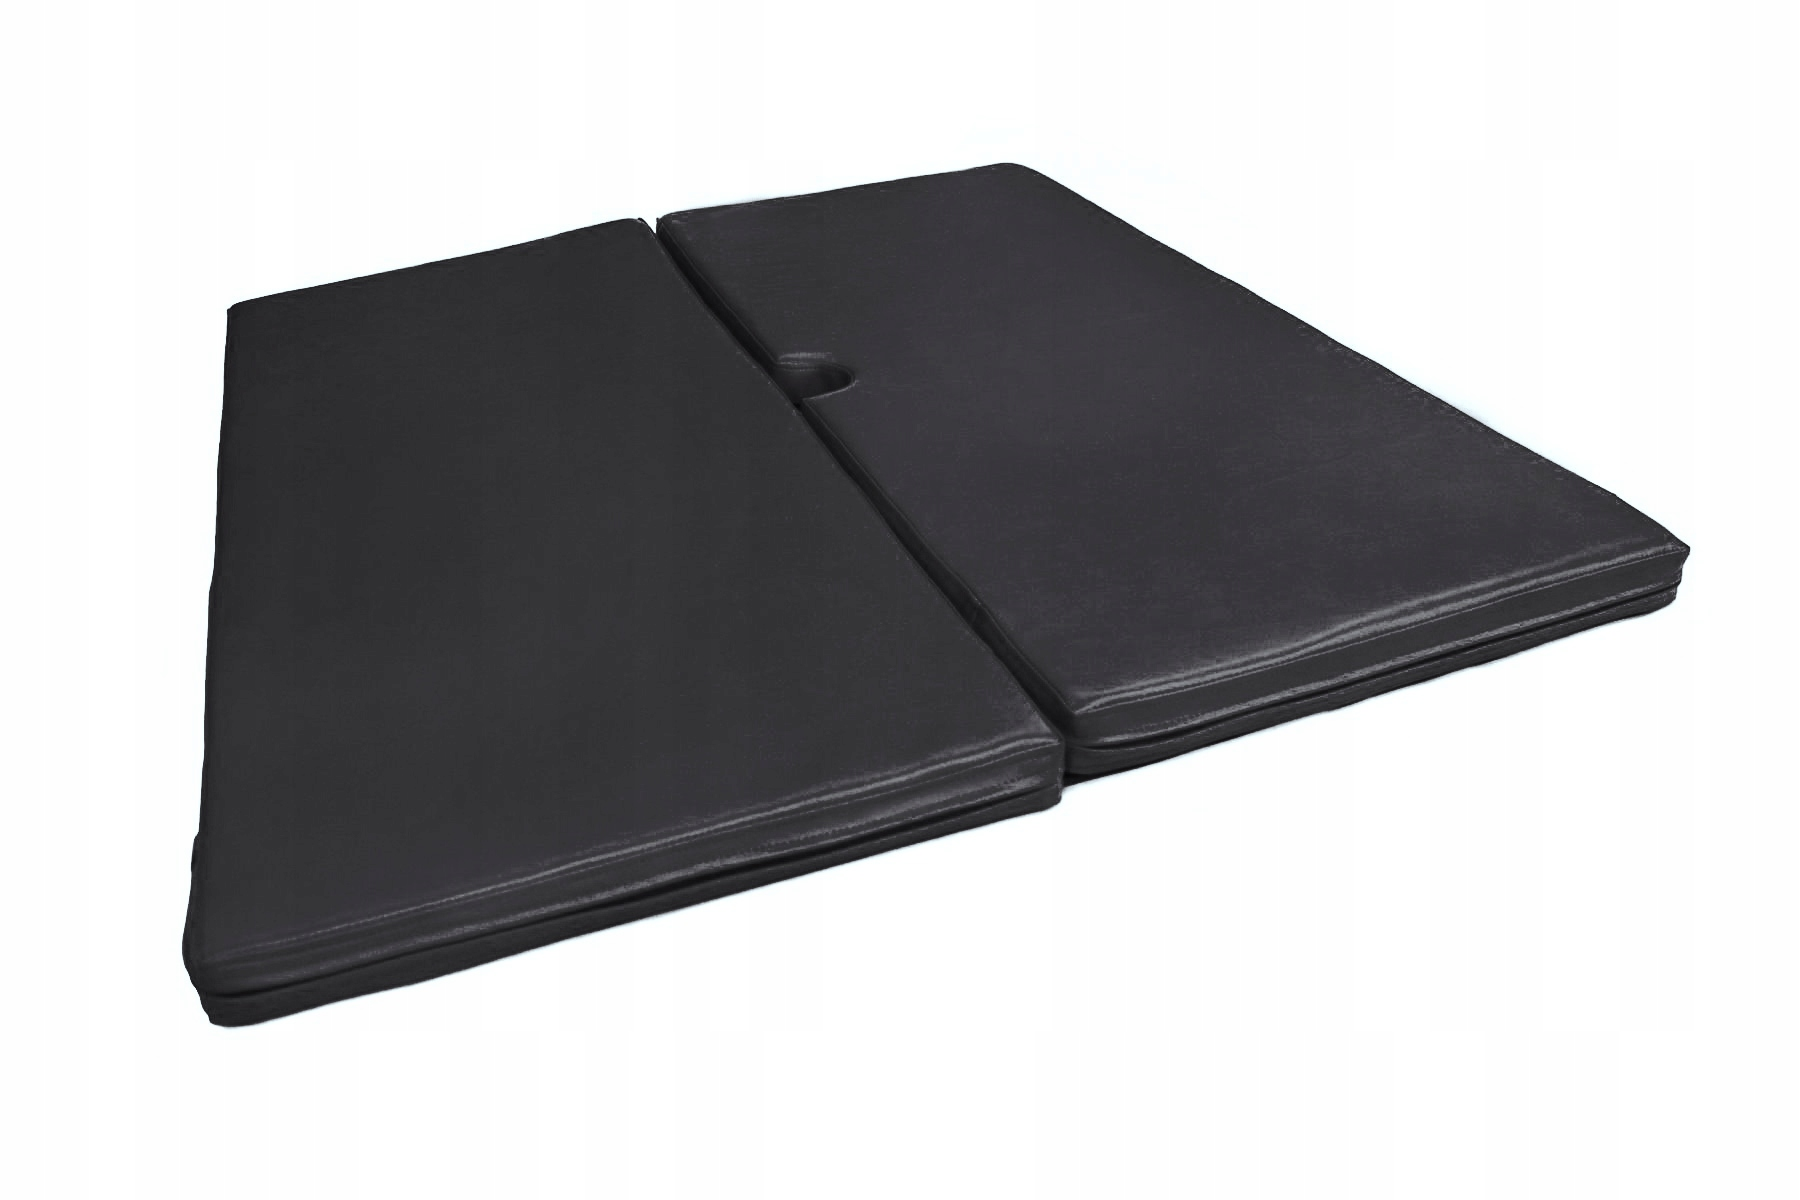 Čierny gymnastický matrac Pole Dance 120 x 100 x 5